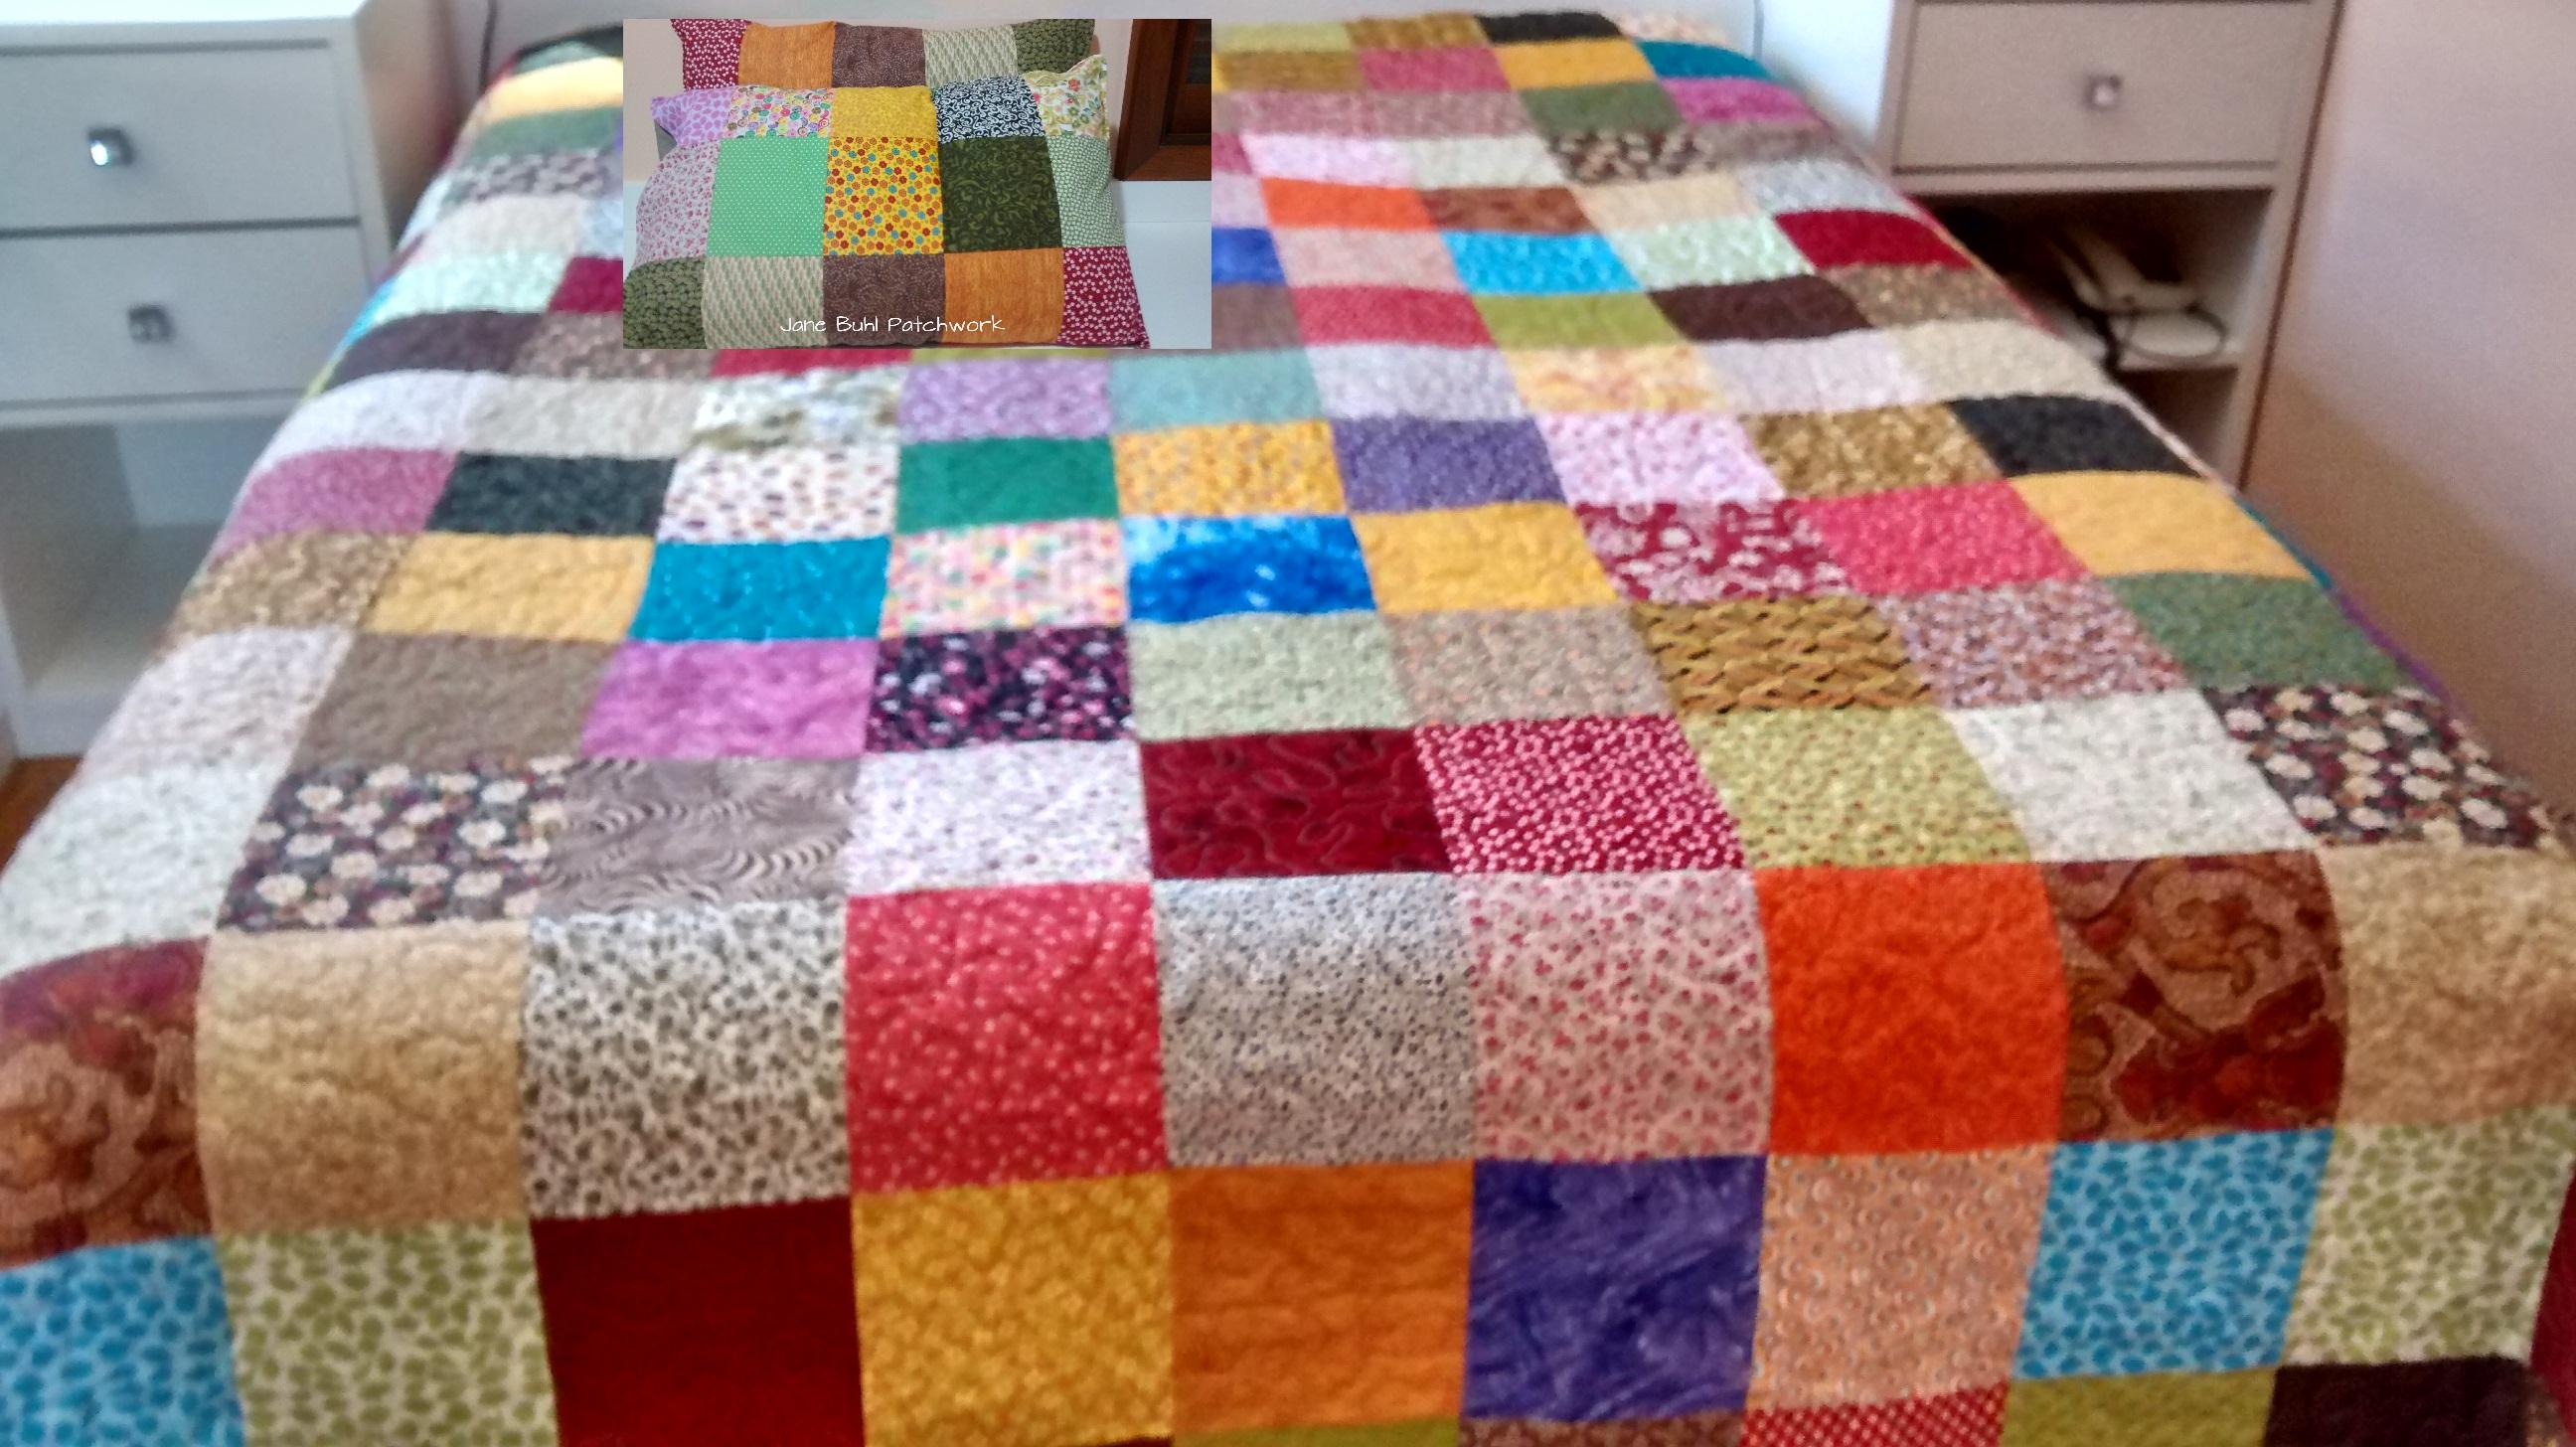 Colcha em patchwork colorida jane buhl patchwork elo7 - Colcha patchwork ...